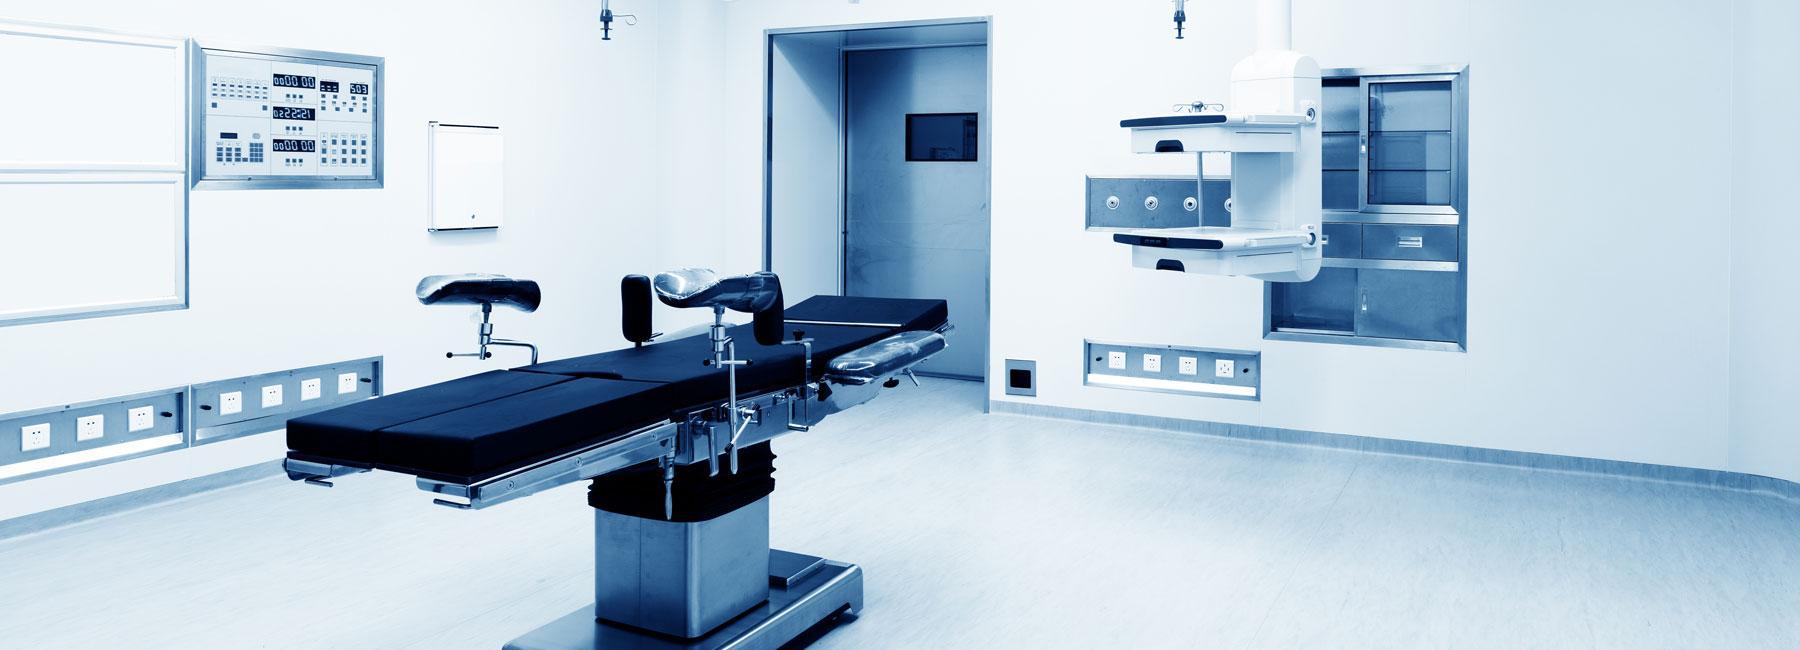 operatingroom.jpg